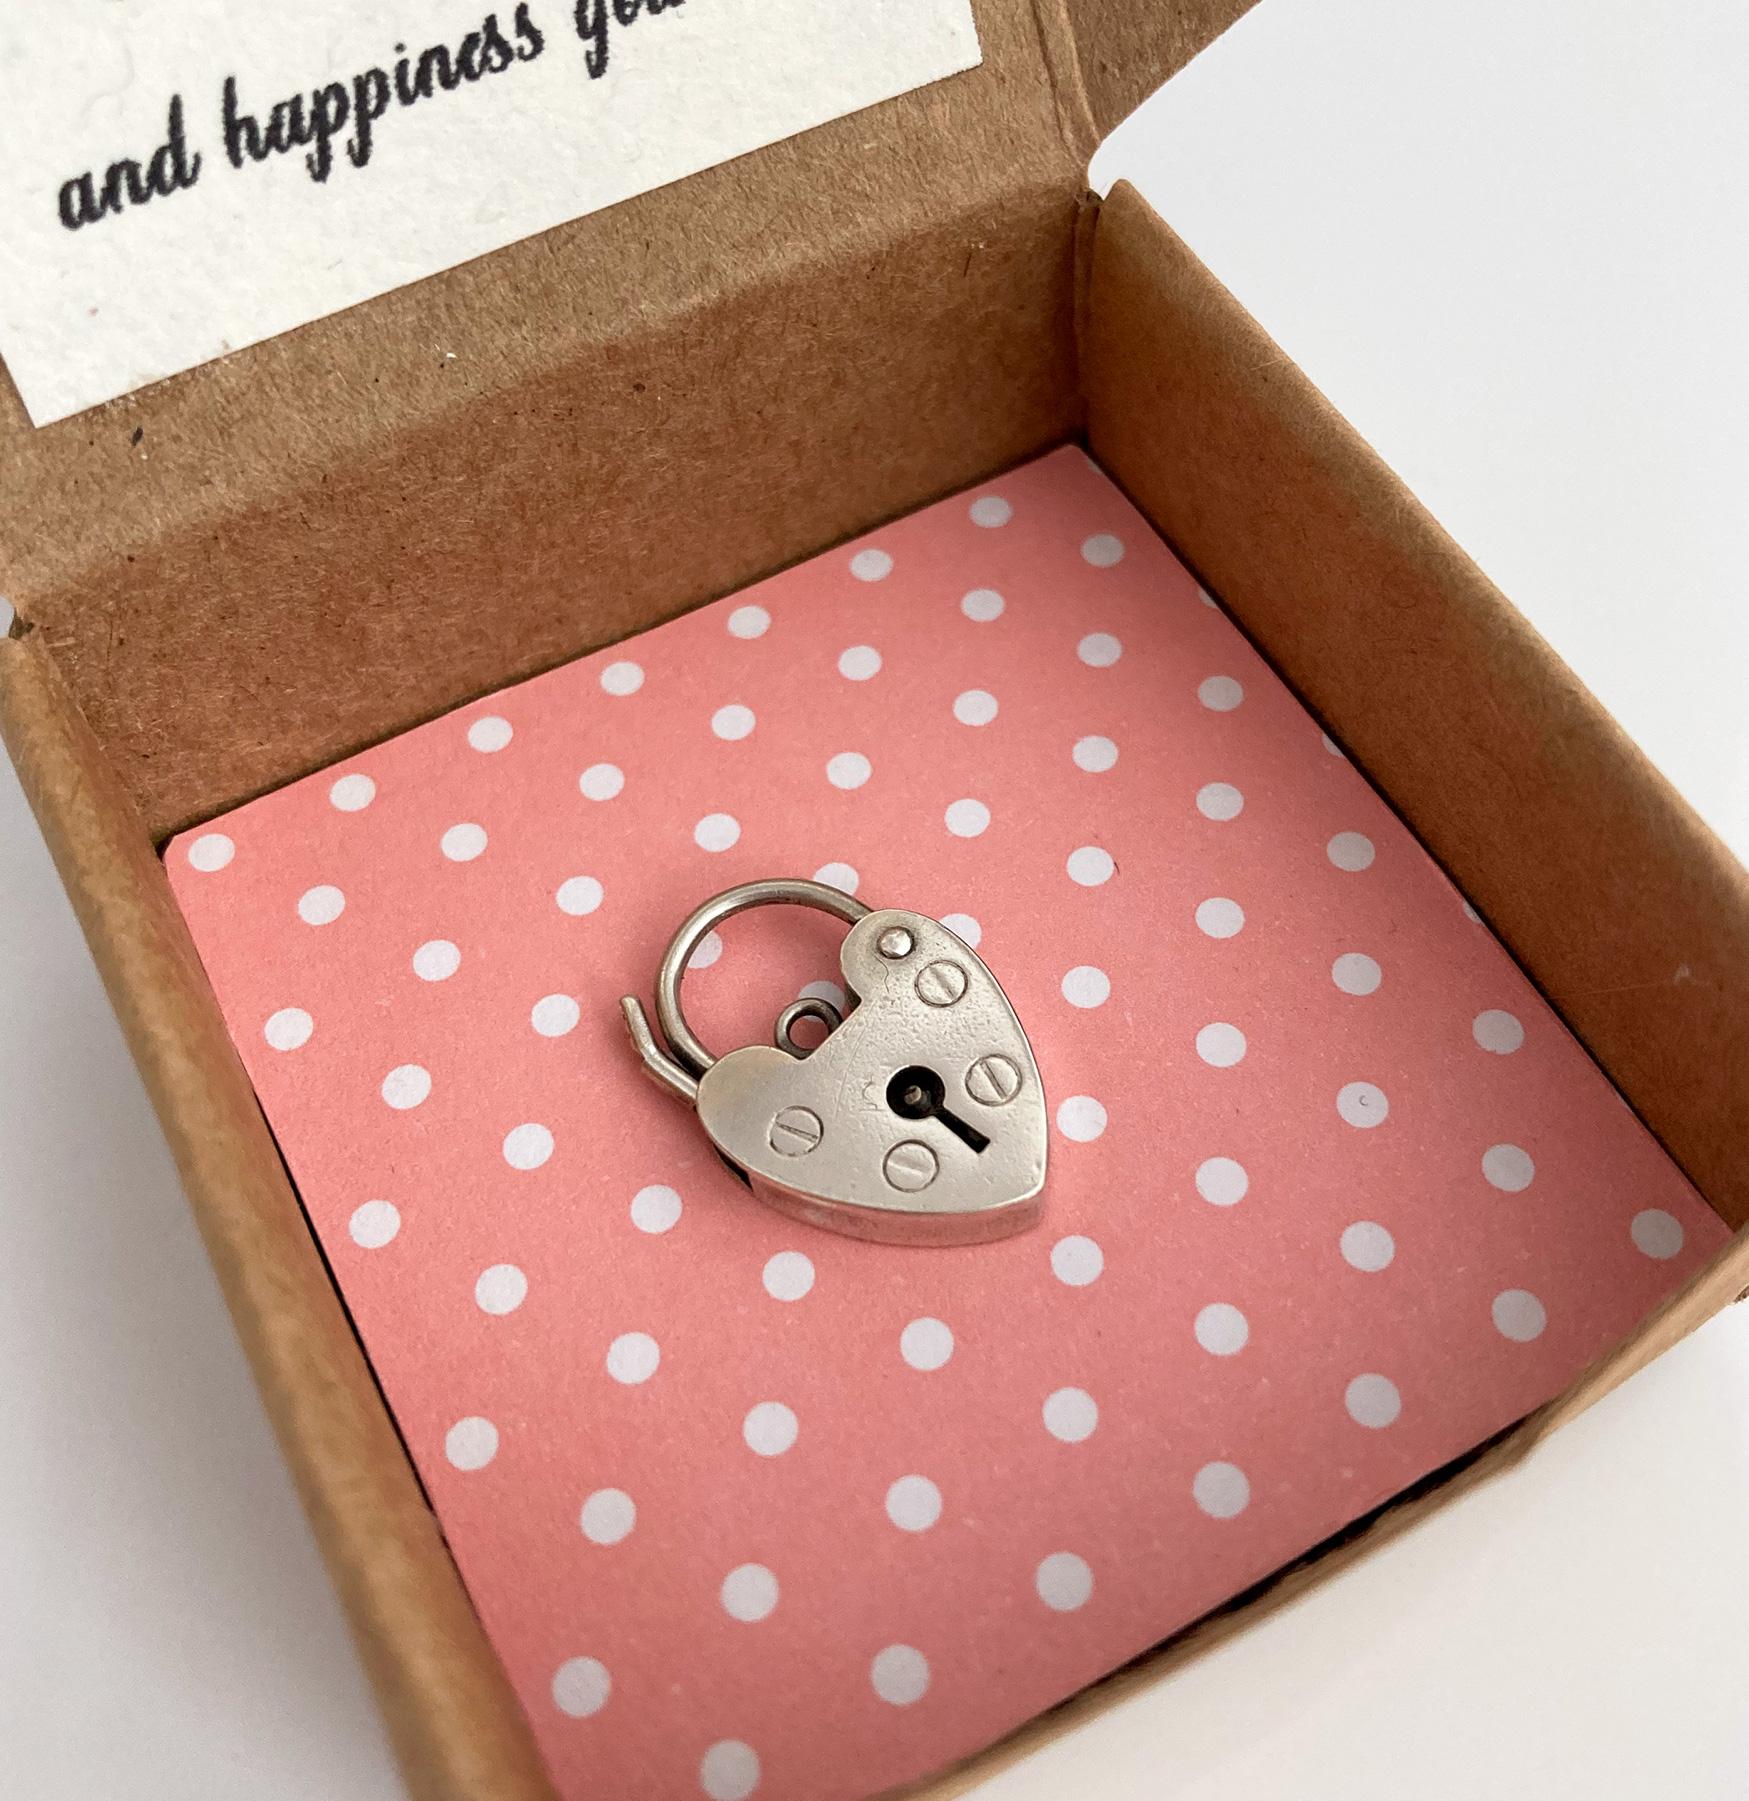 vintage silver heart shaped padlock